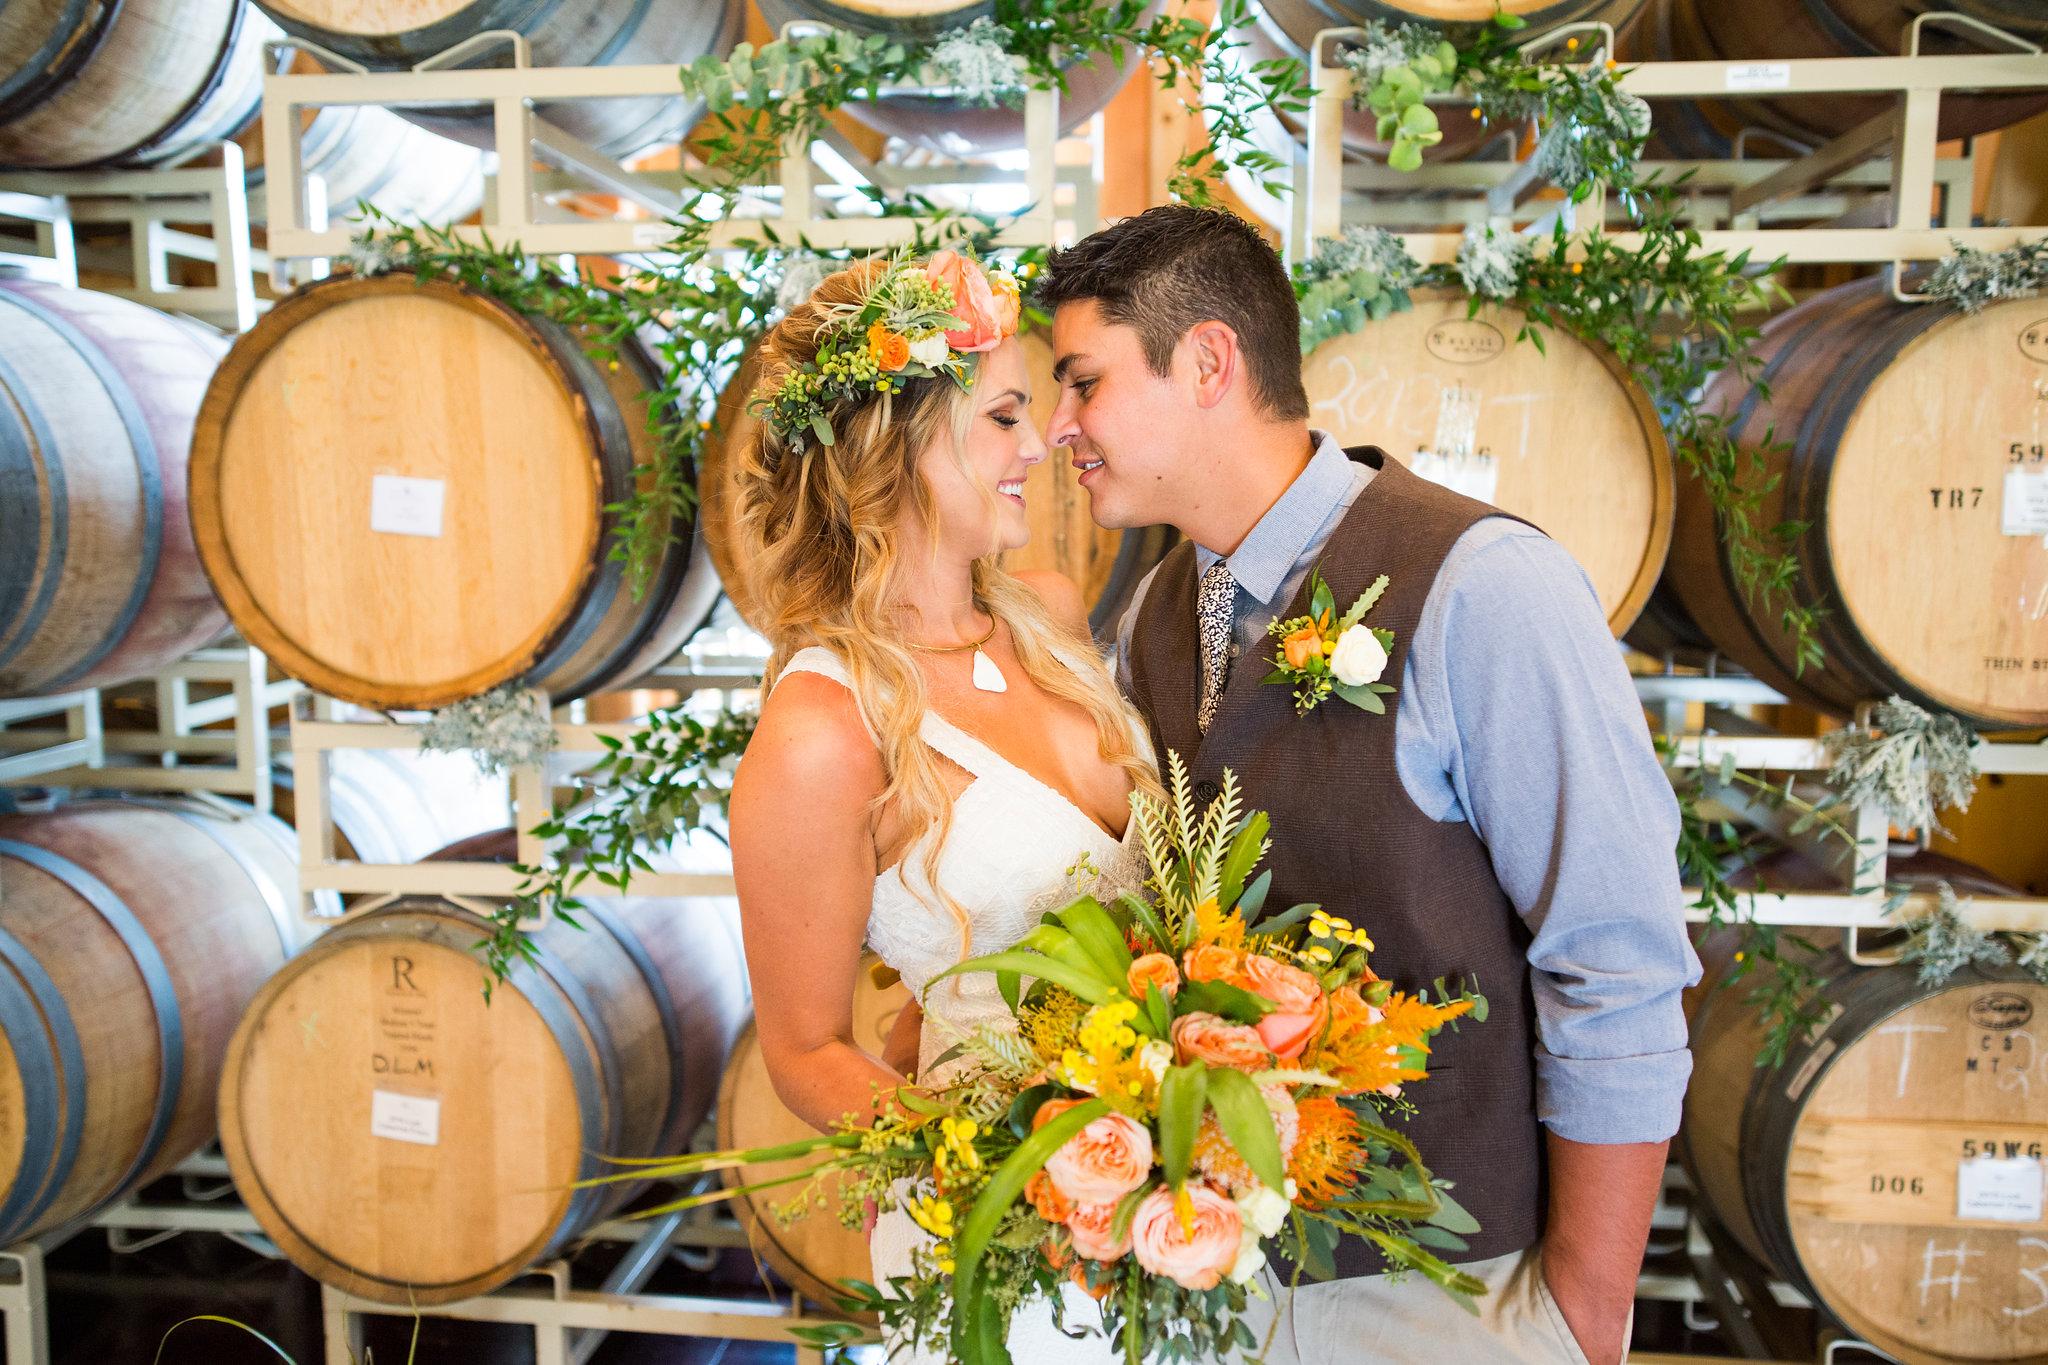 Sweet_Heart_Winery_Wedding_Ashley_McKenzie_Photography_181.JPG